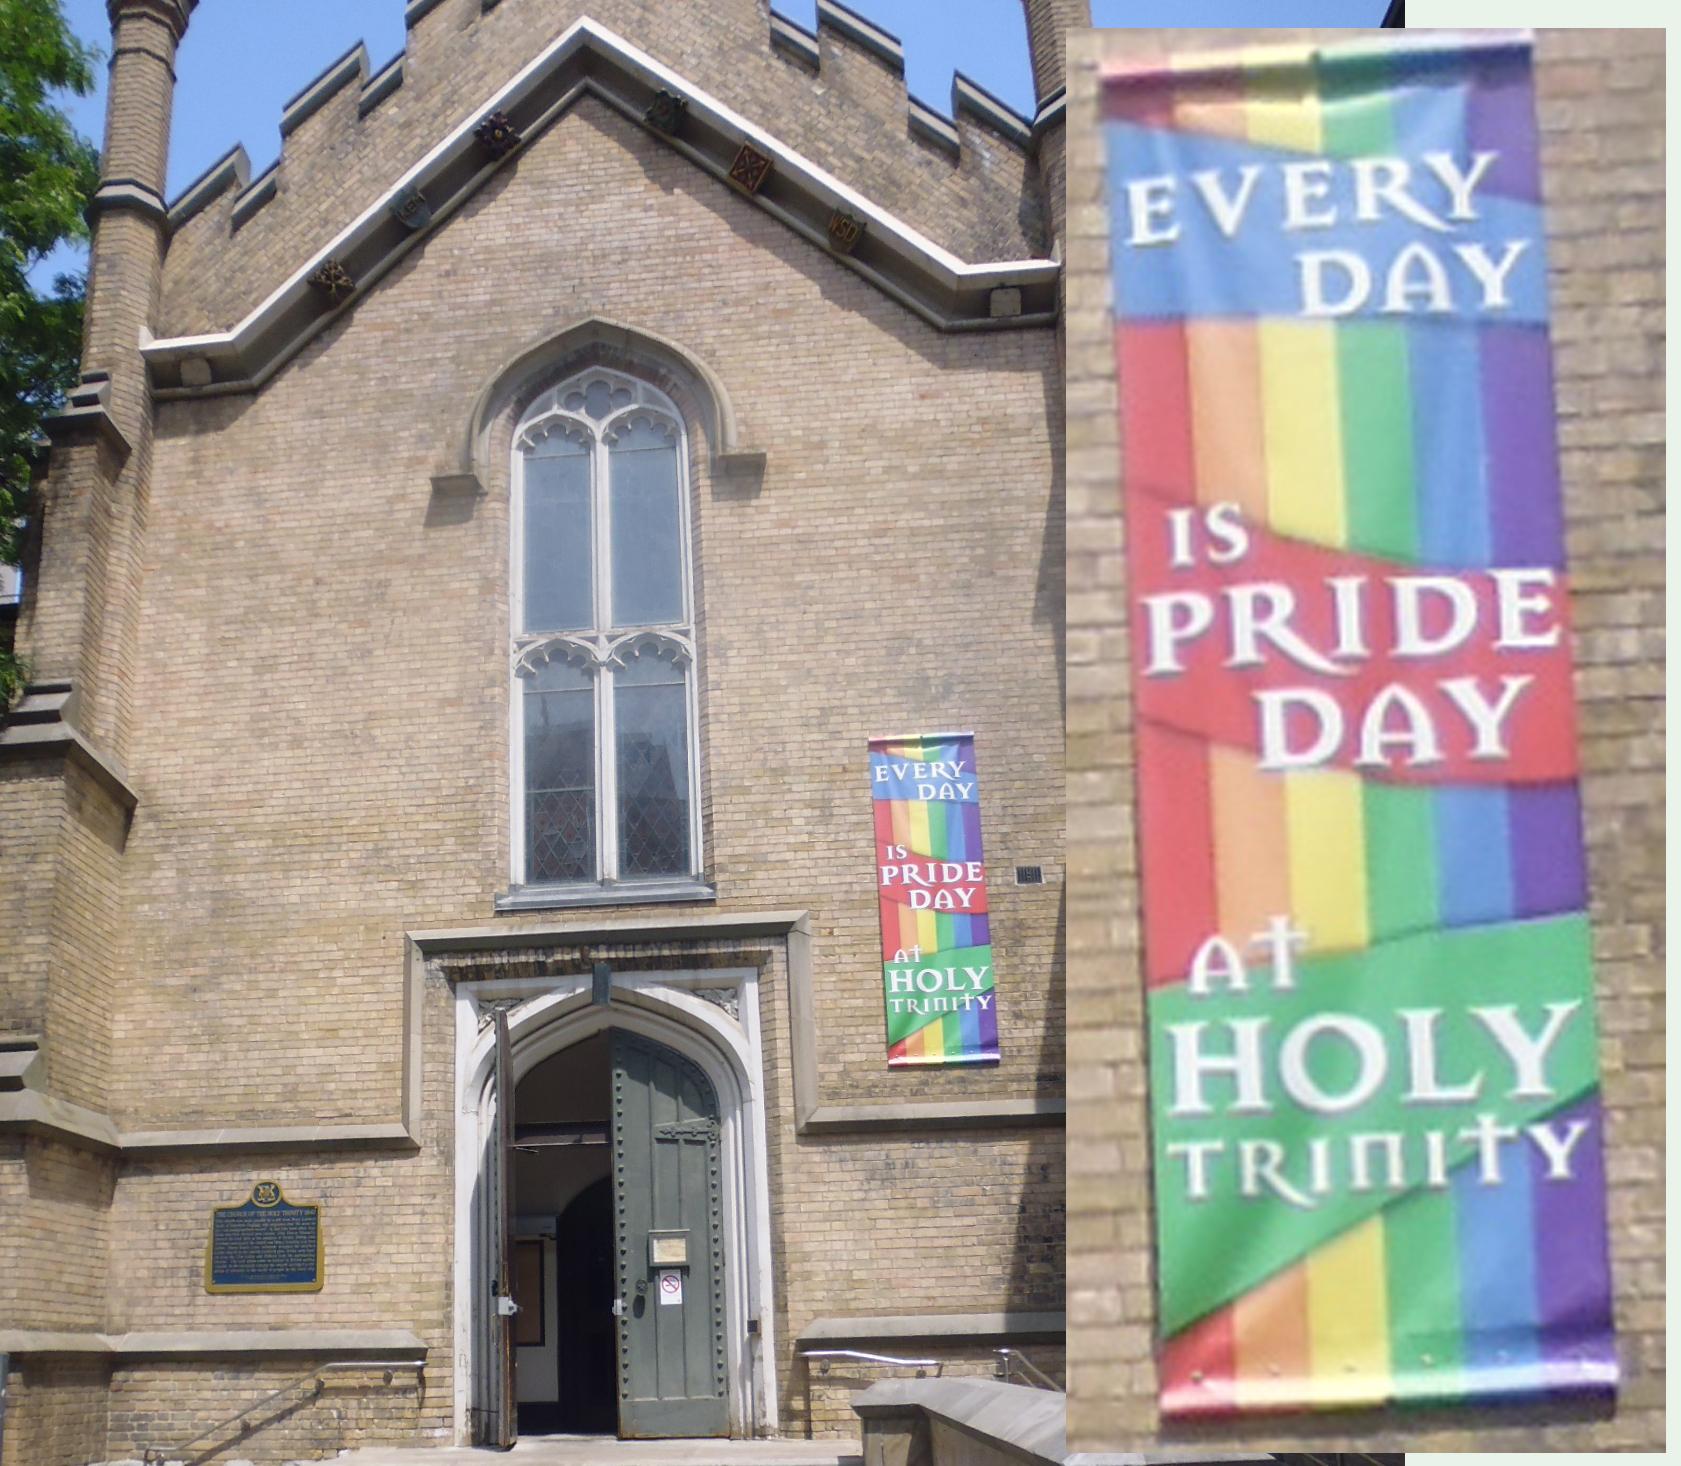 Holy Triinity Toronto copy.jpg